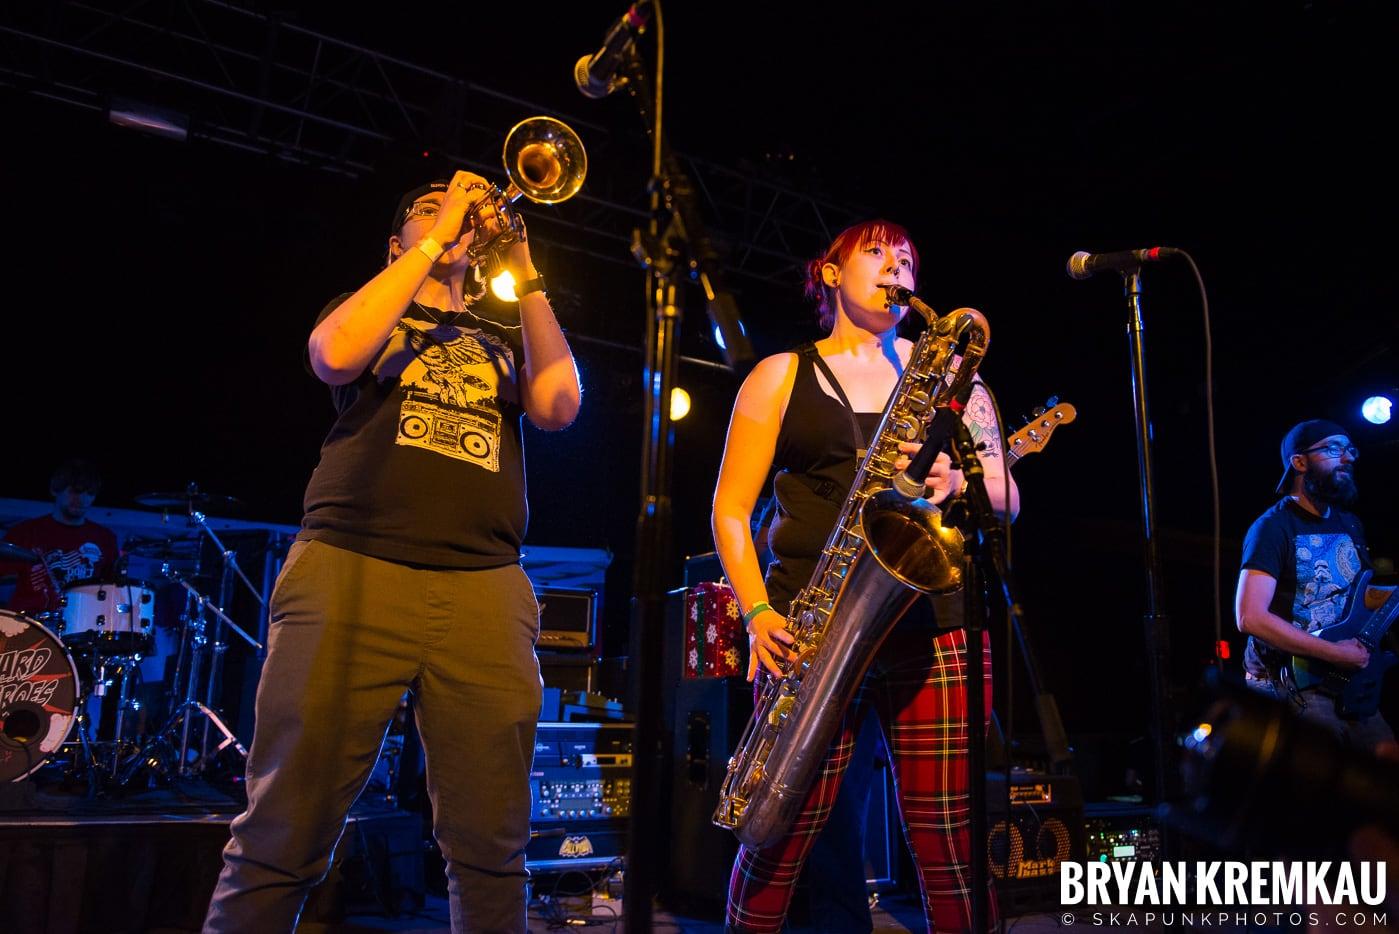 Backyard Superheroes @ Starland Ballroom, Sayreville, NJ - 11.23.18 (36)